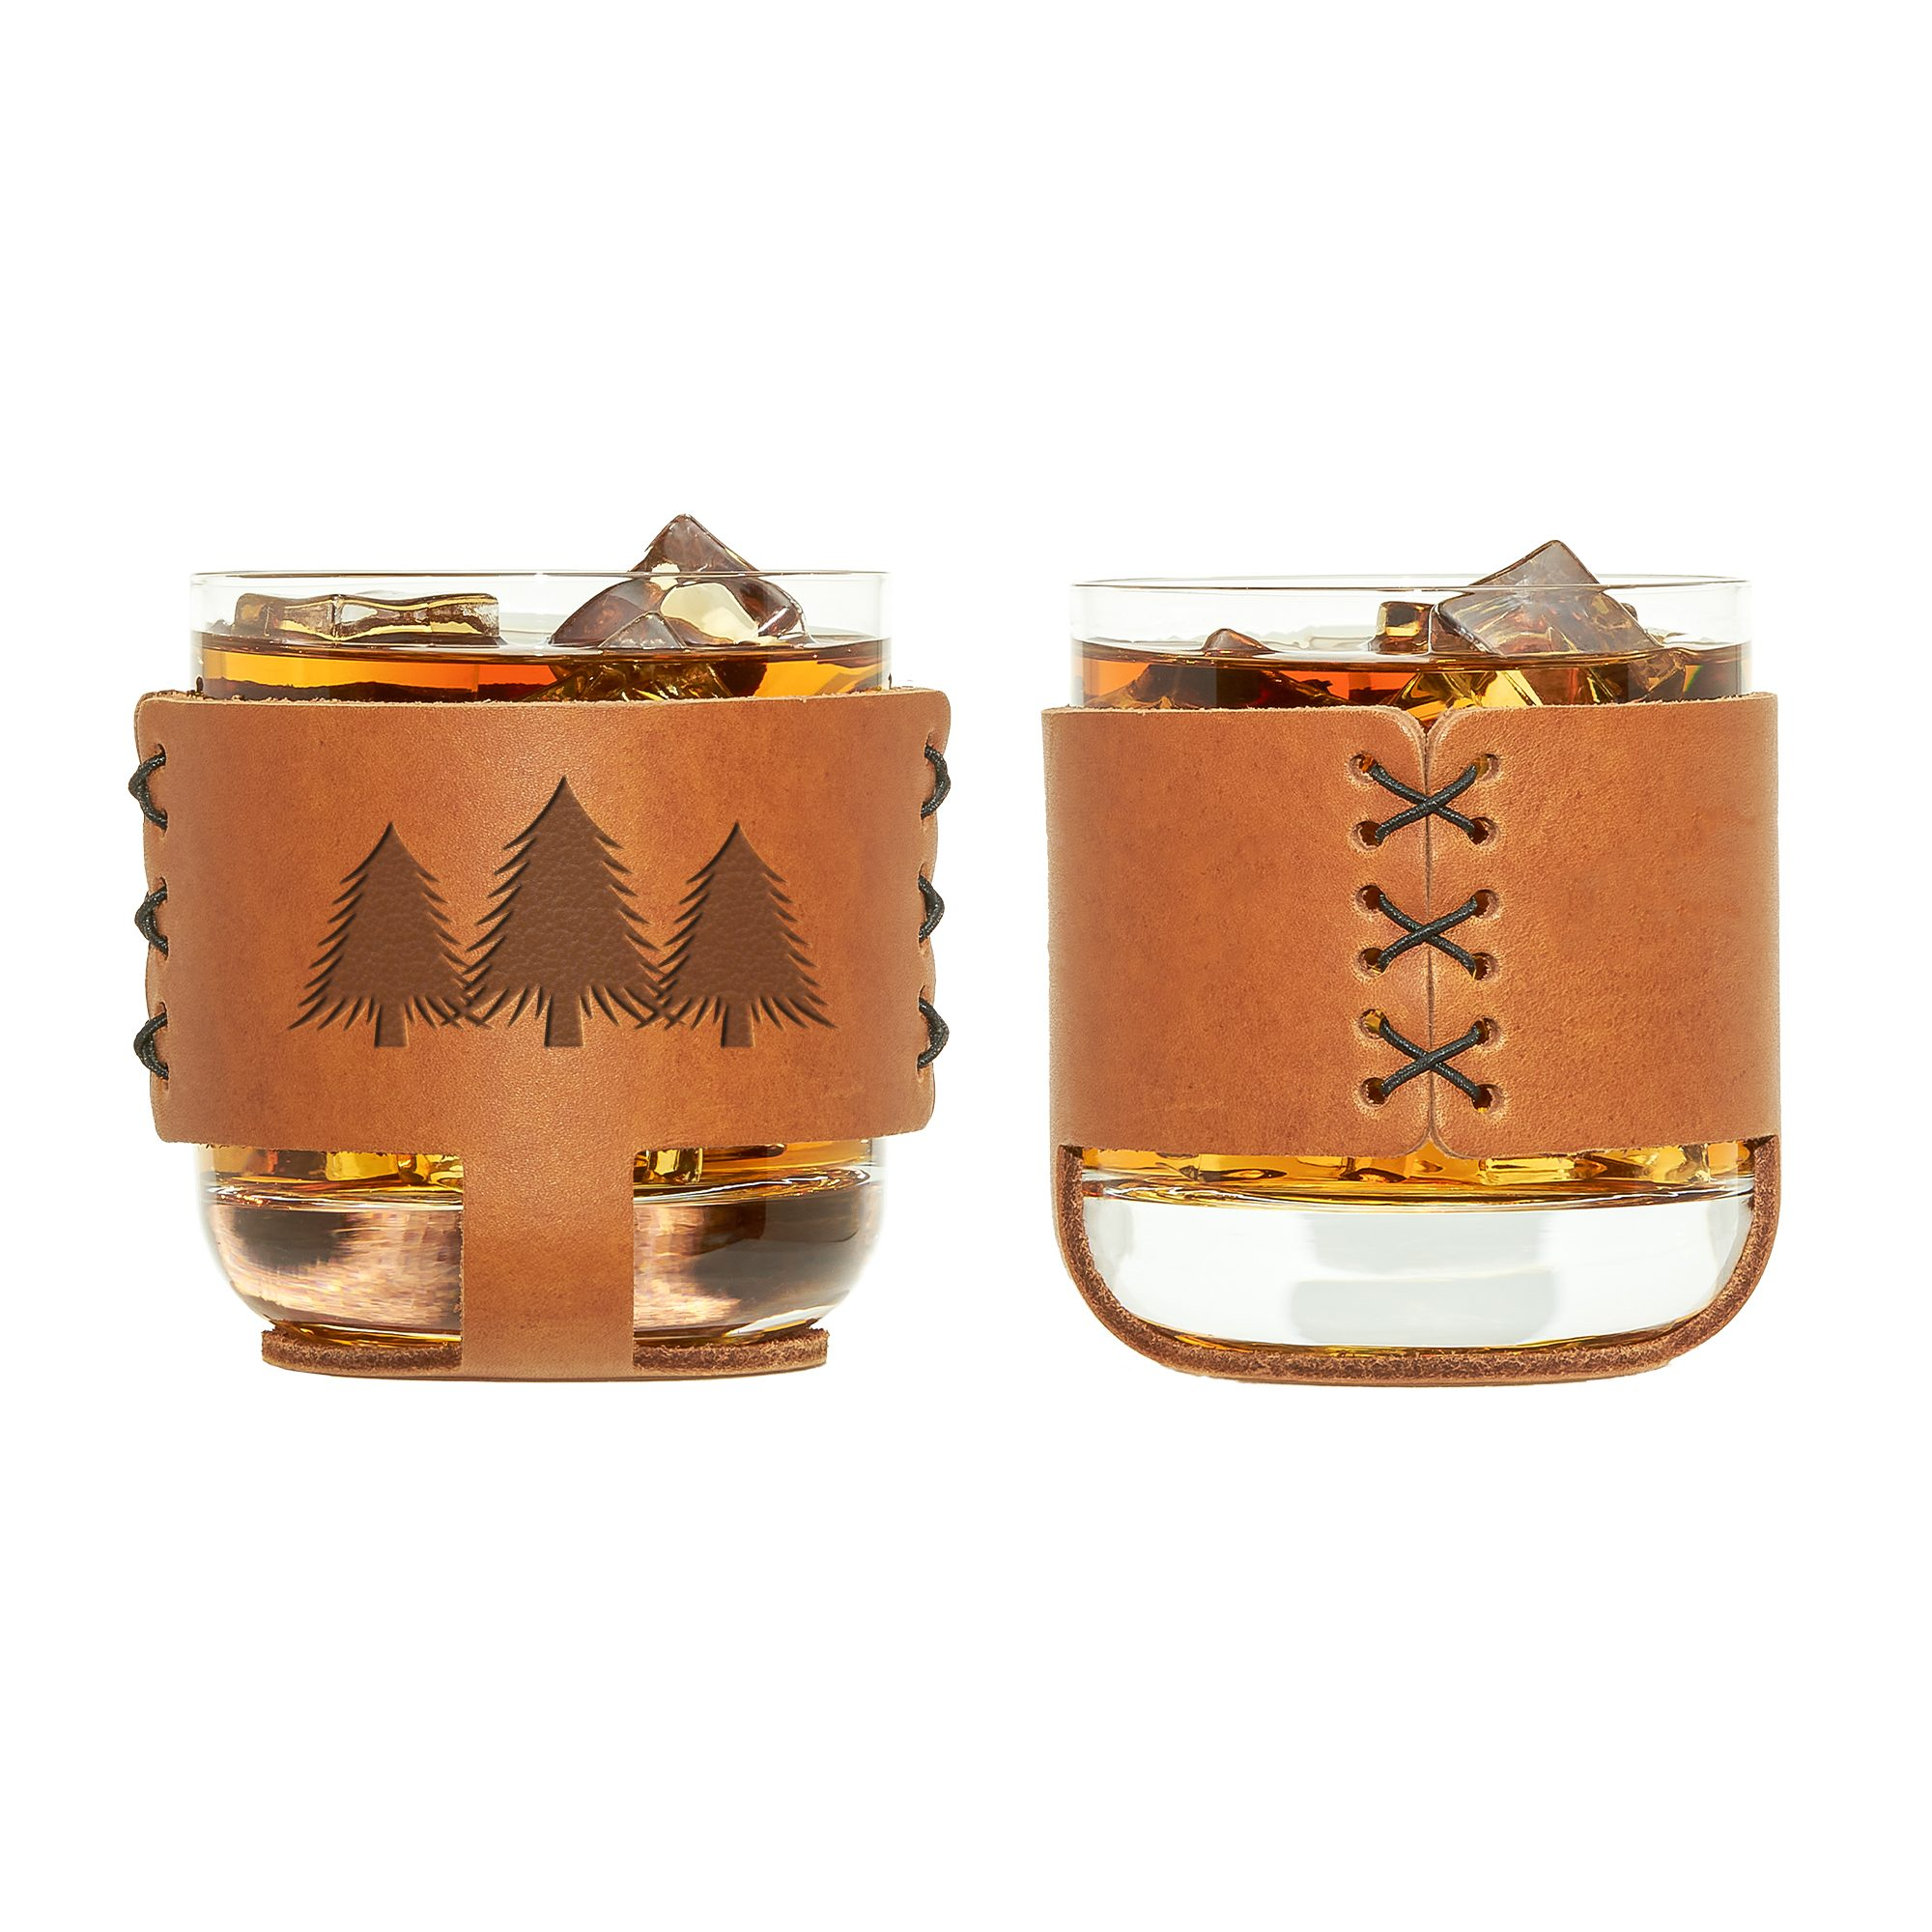 9oz Rocks Sleeve Set of 2 with Glasses: Pine Trees